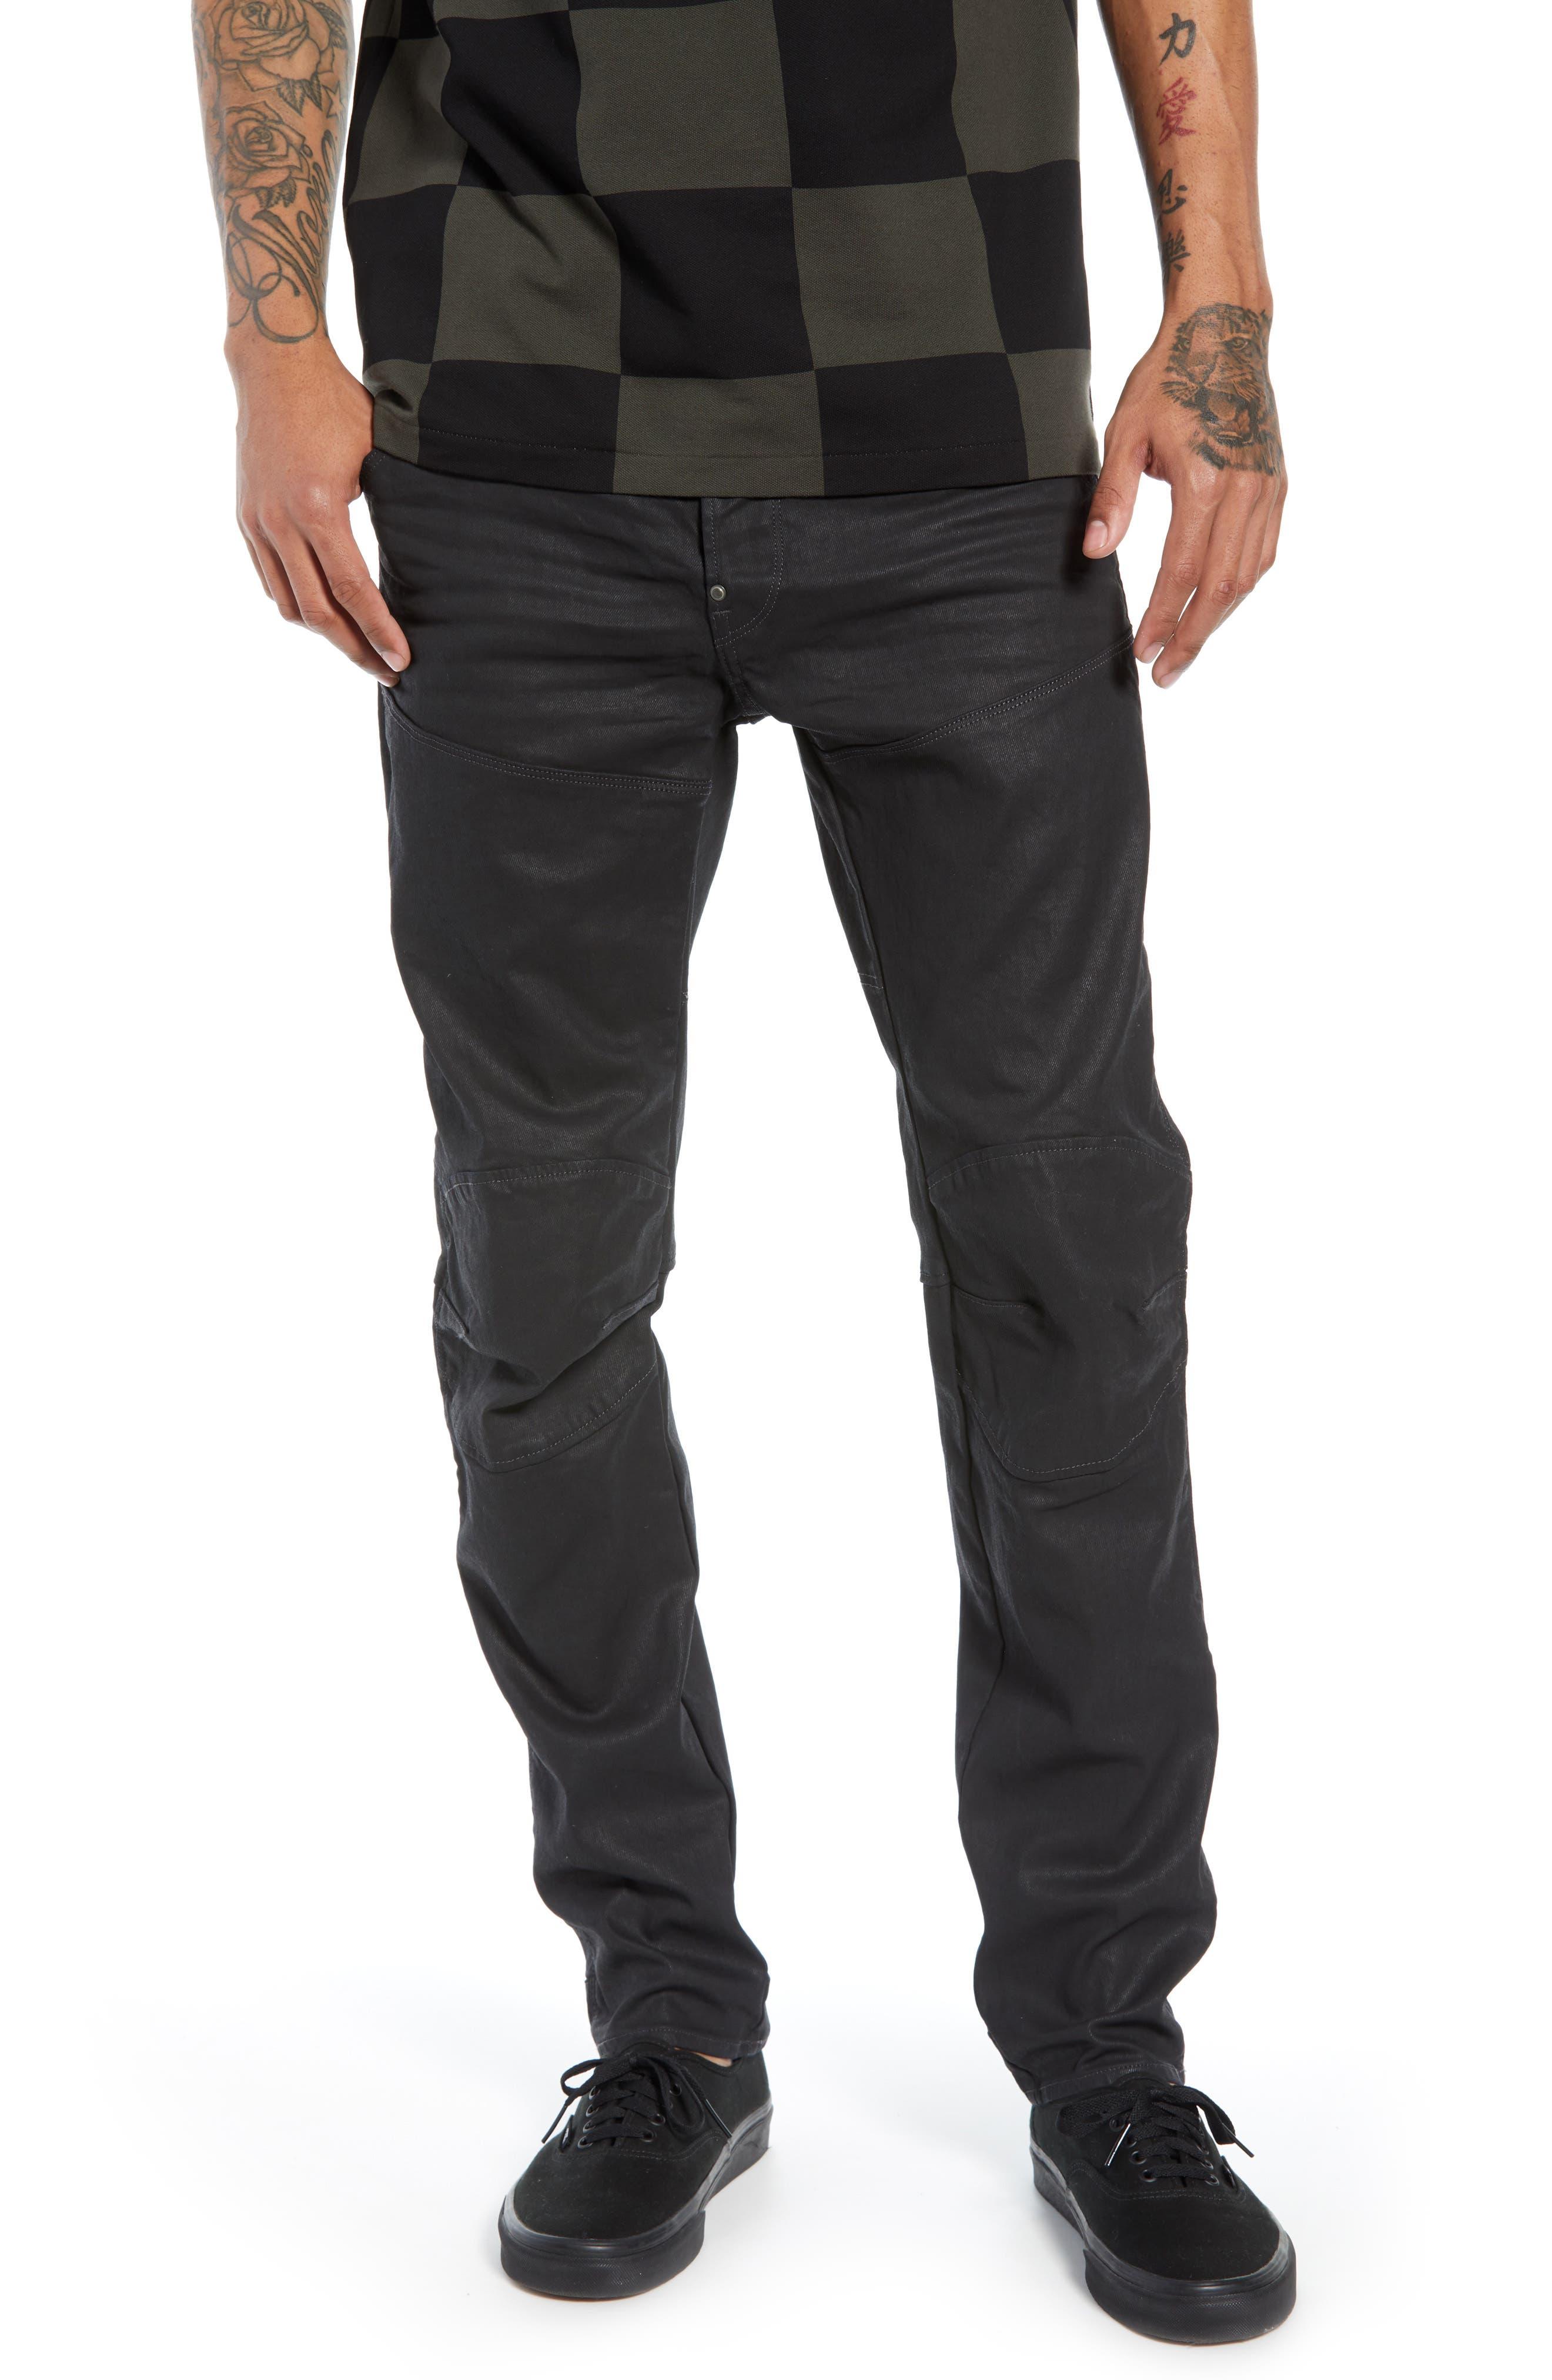 3D Coated Slim Jeans,                             Main thumbnail 1, color,                             3D DARK AGED